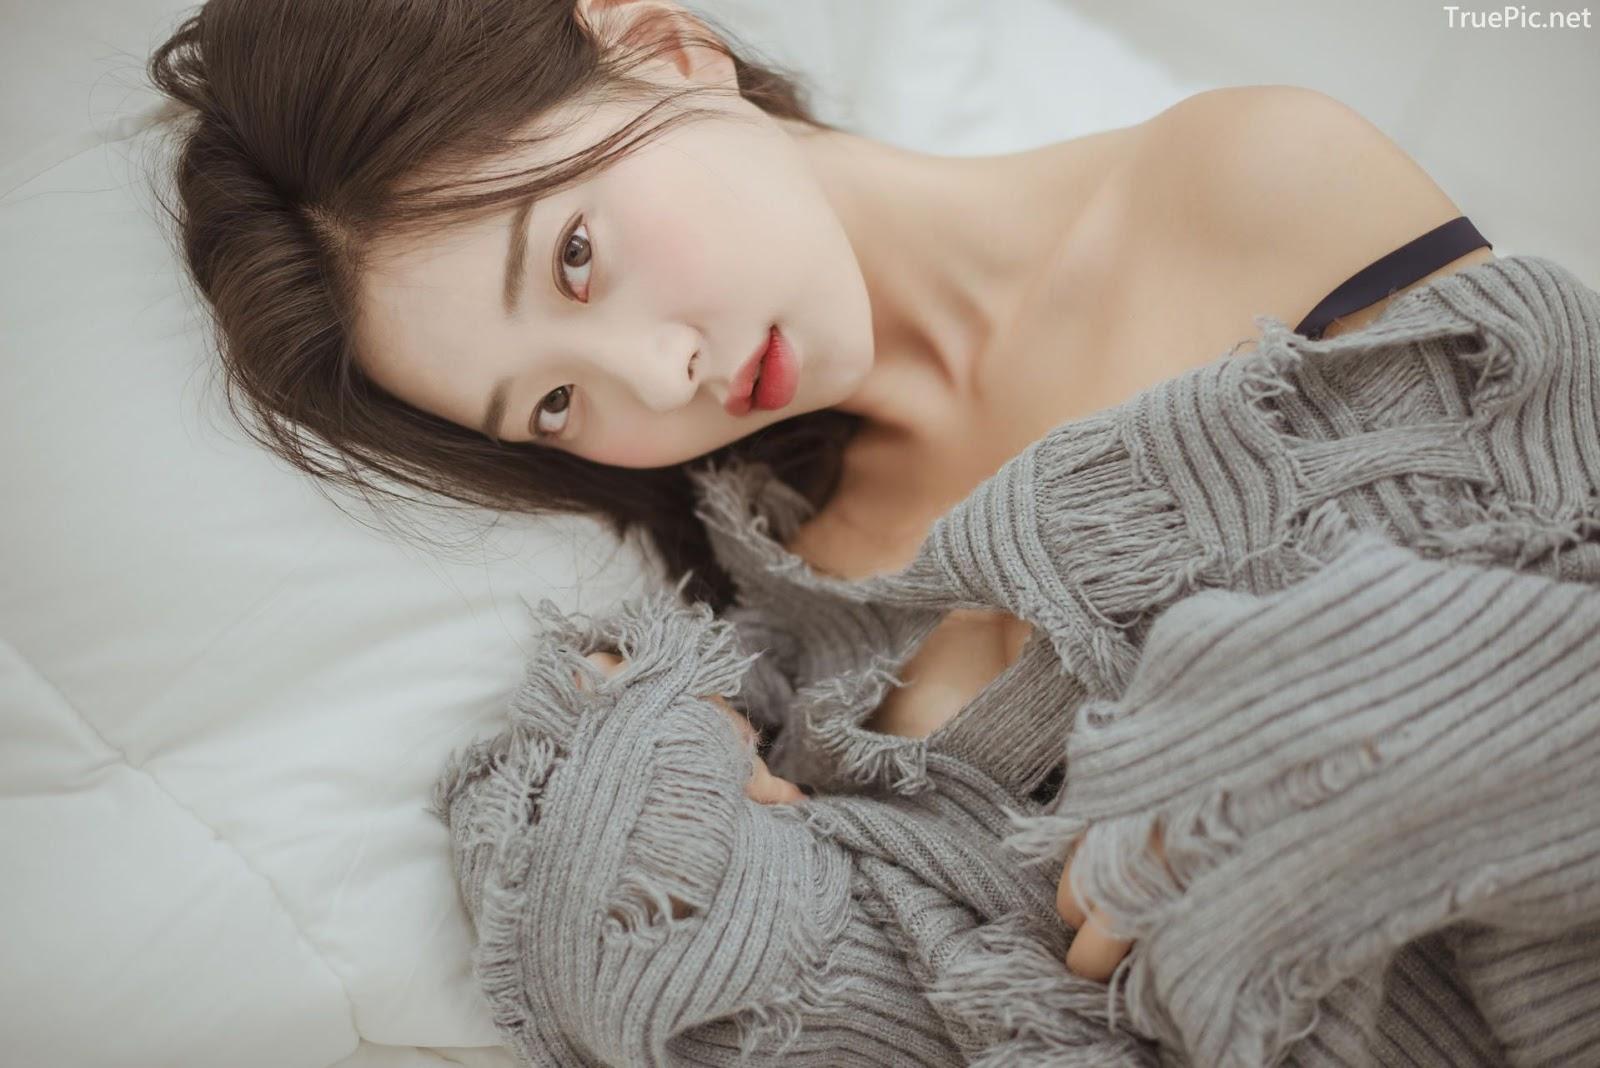 Korean hot model and fashion - Shin Jae Eun - Various Sets collection - Picture 3